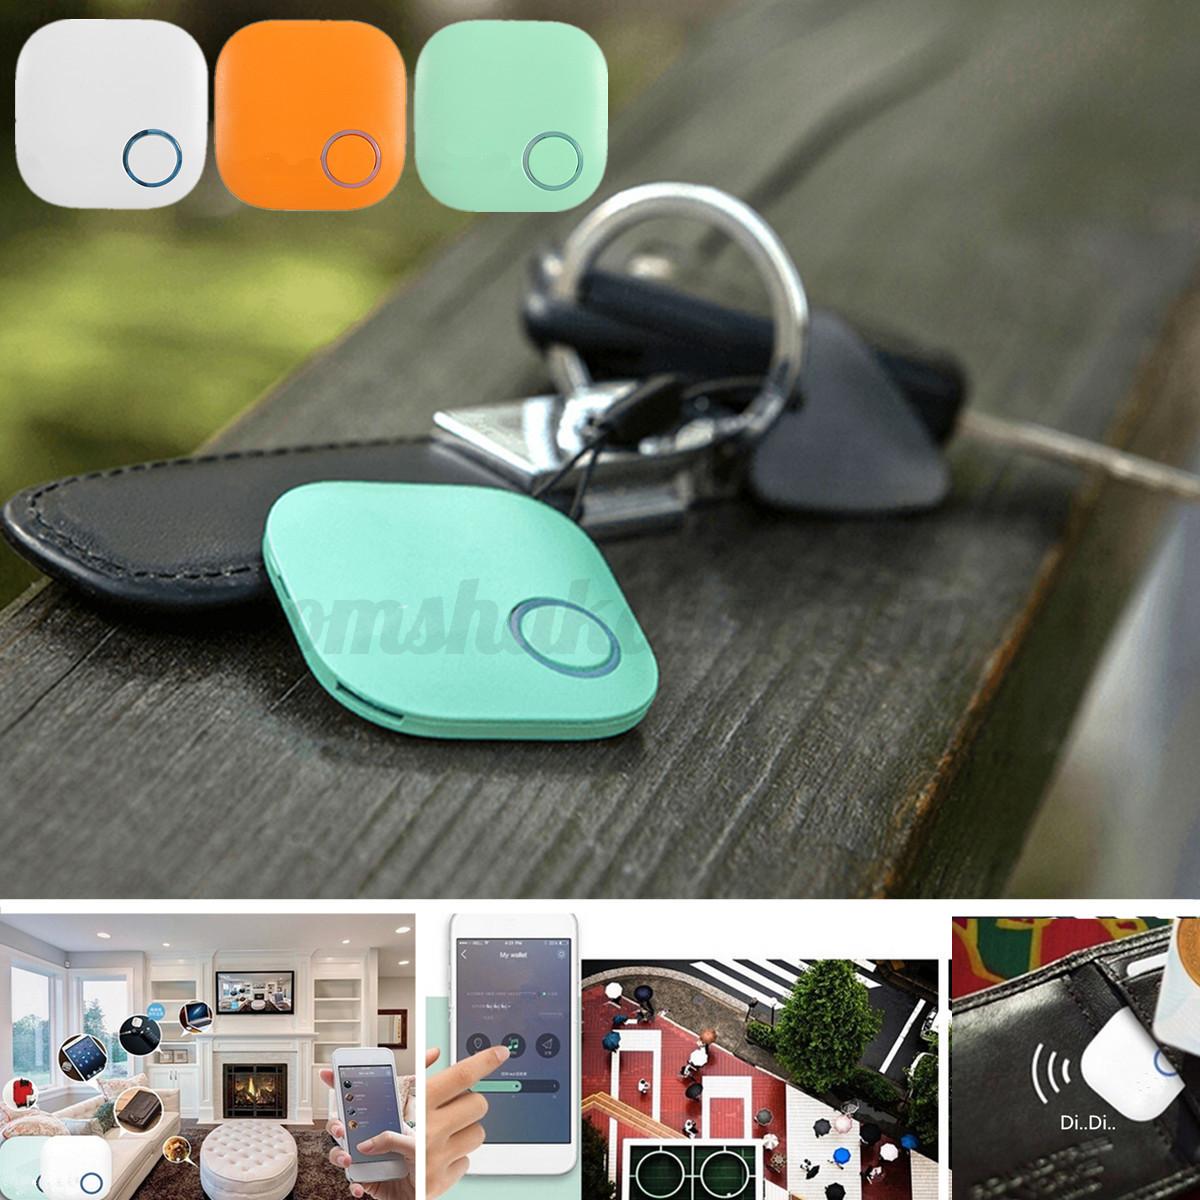 tile key finder australia by au nut 2 smart tag bluetooth tile tracker key finder anti